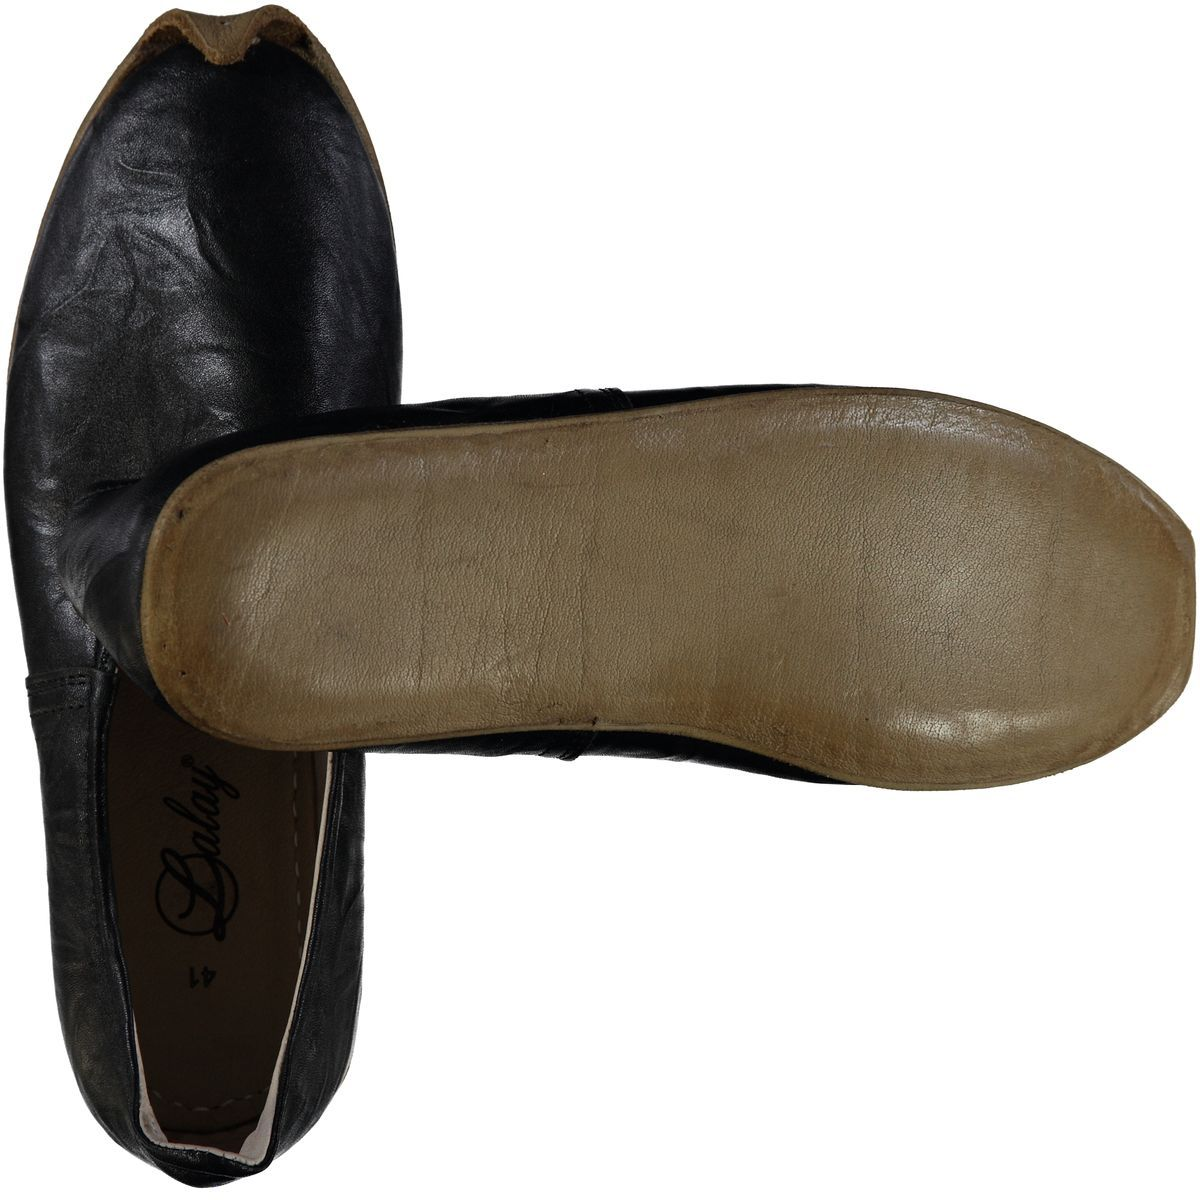 Shoe - Babouche / Leather / Handmade - Black